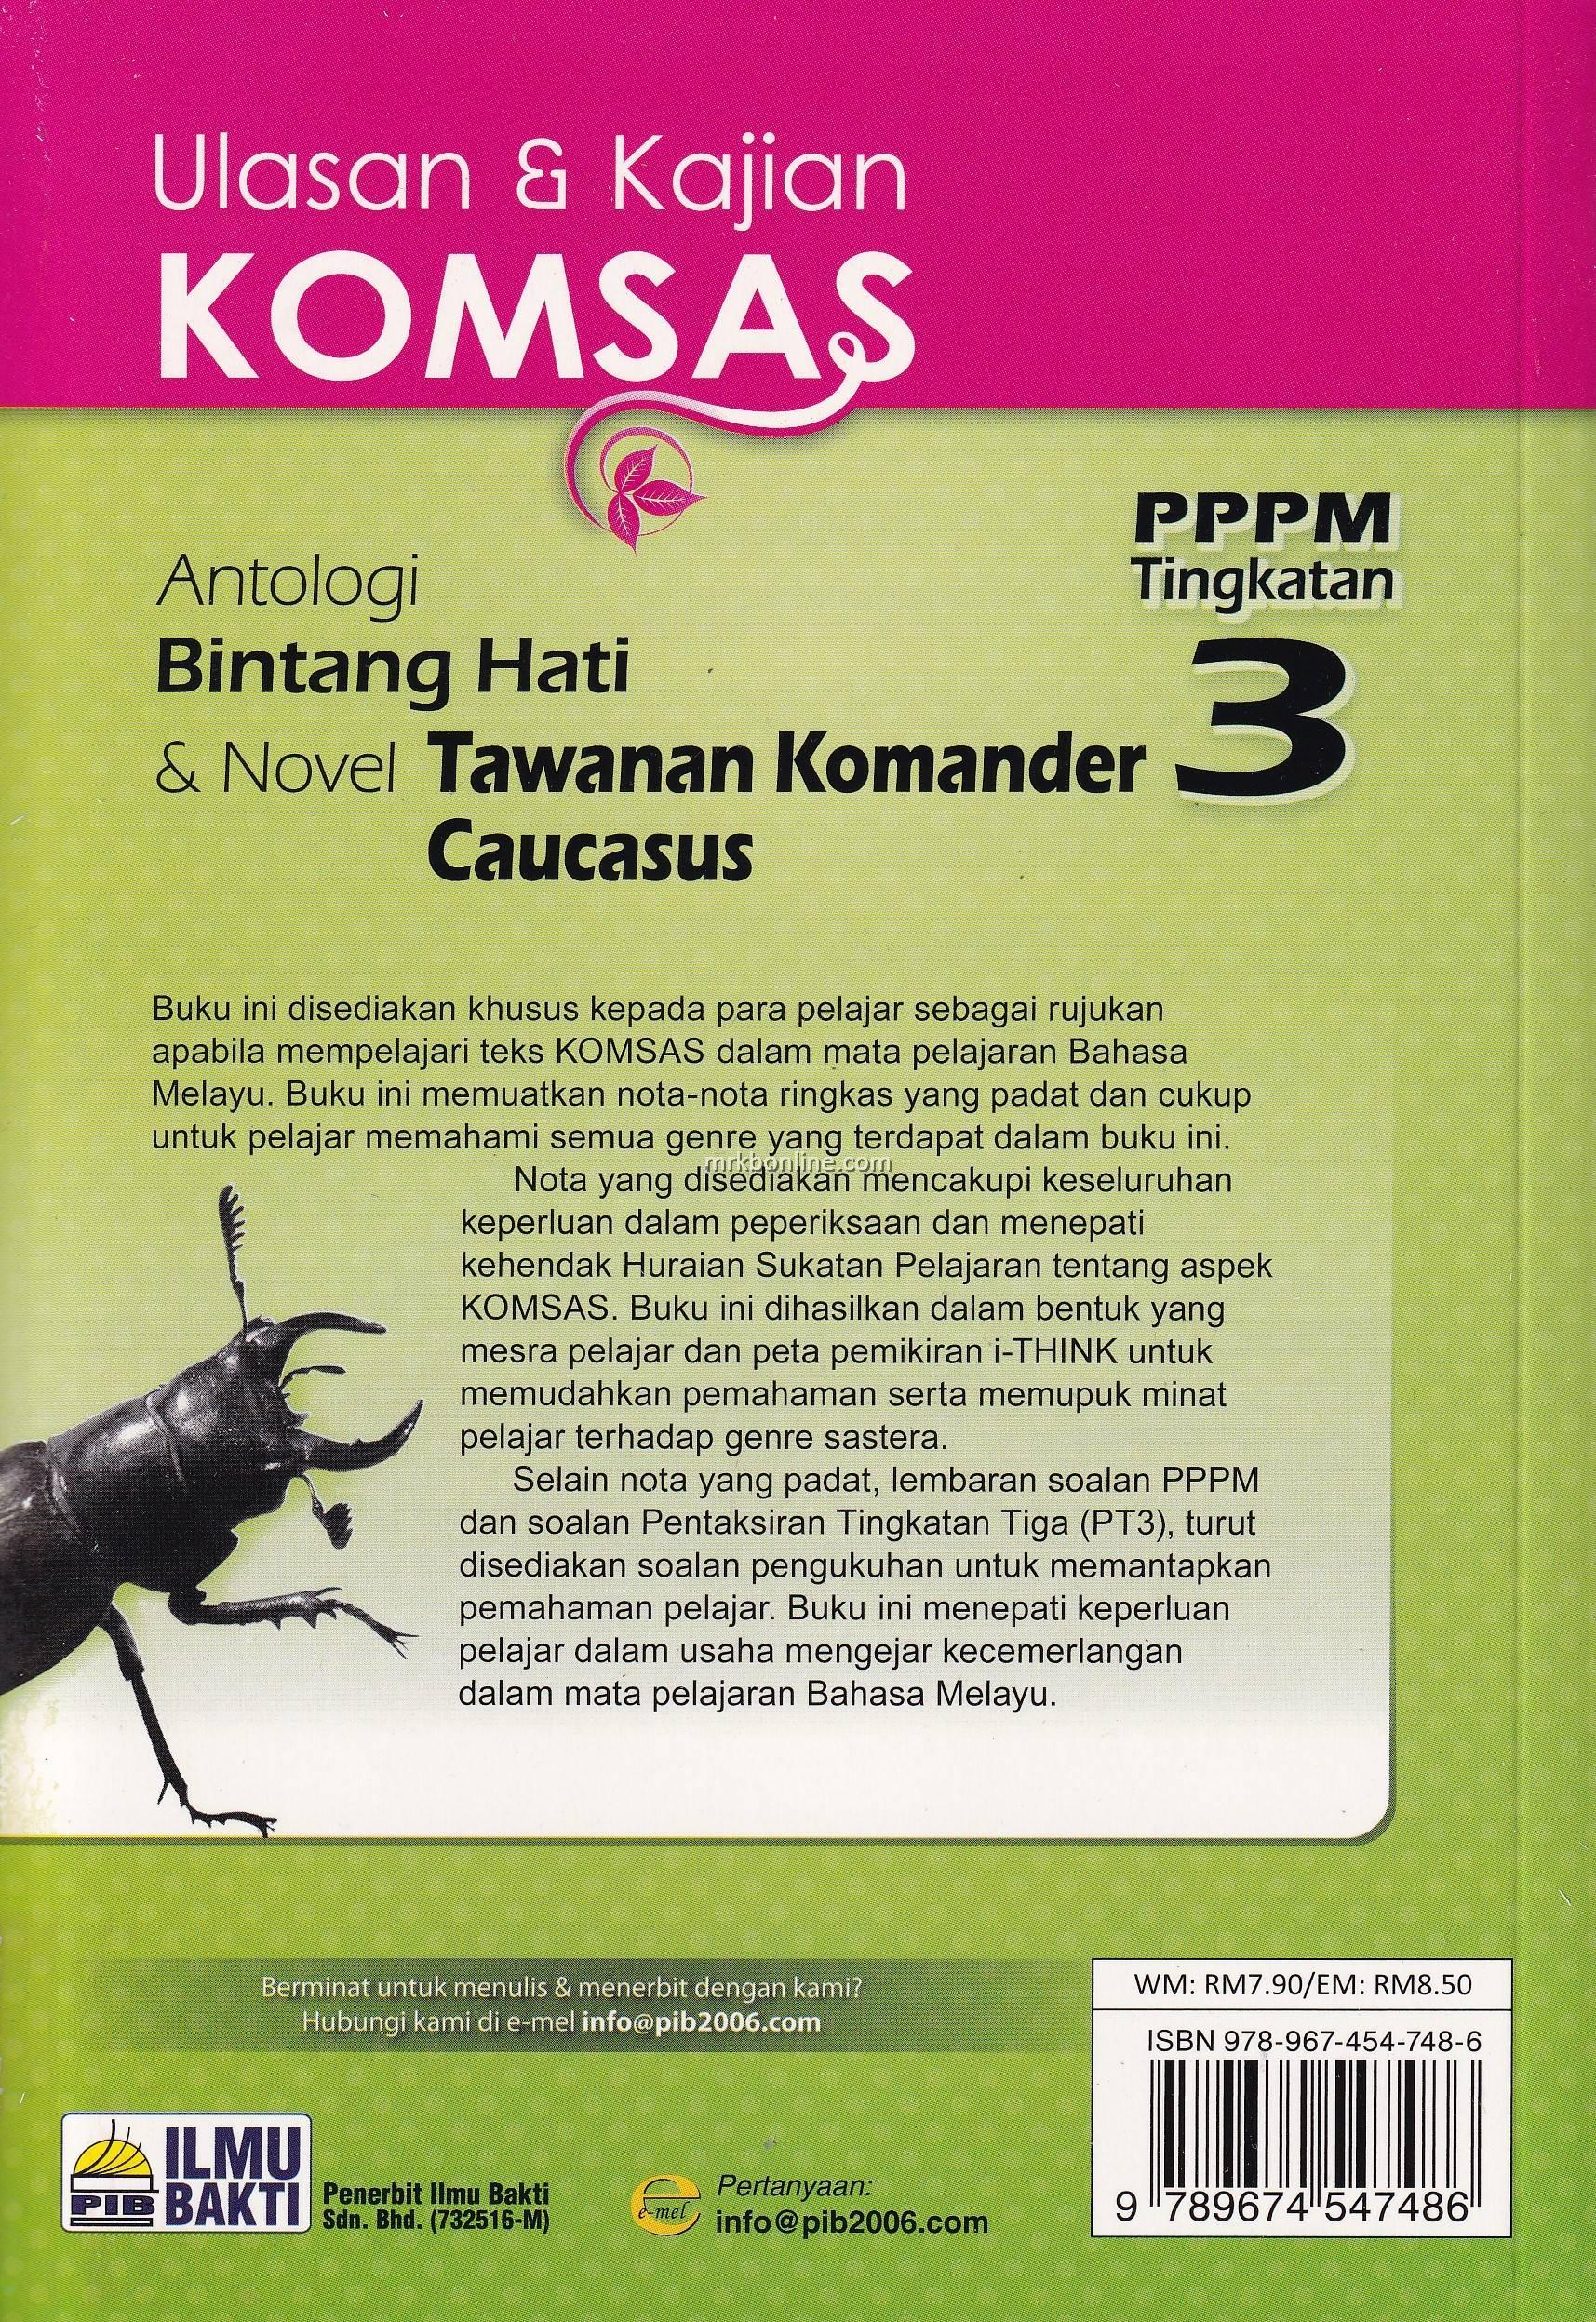 Ulasan & Kajian Komsas (Antologi - Bintang Hati & Novel ...